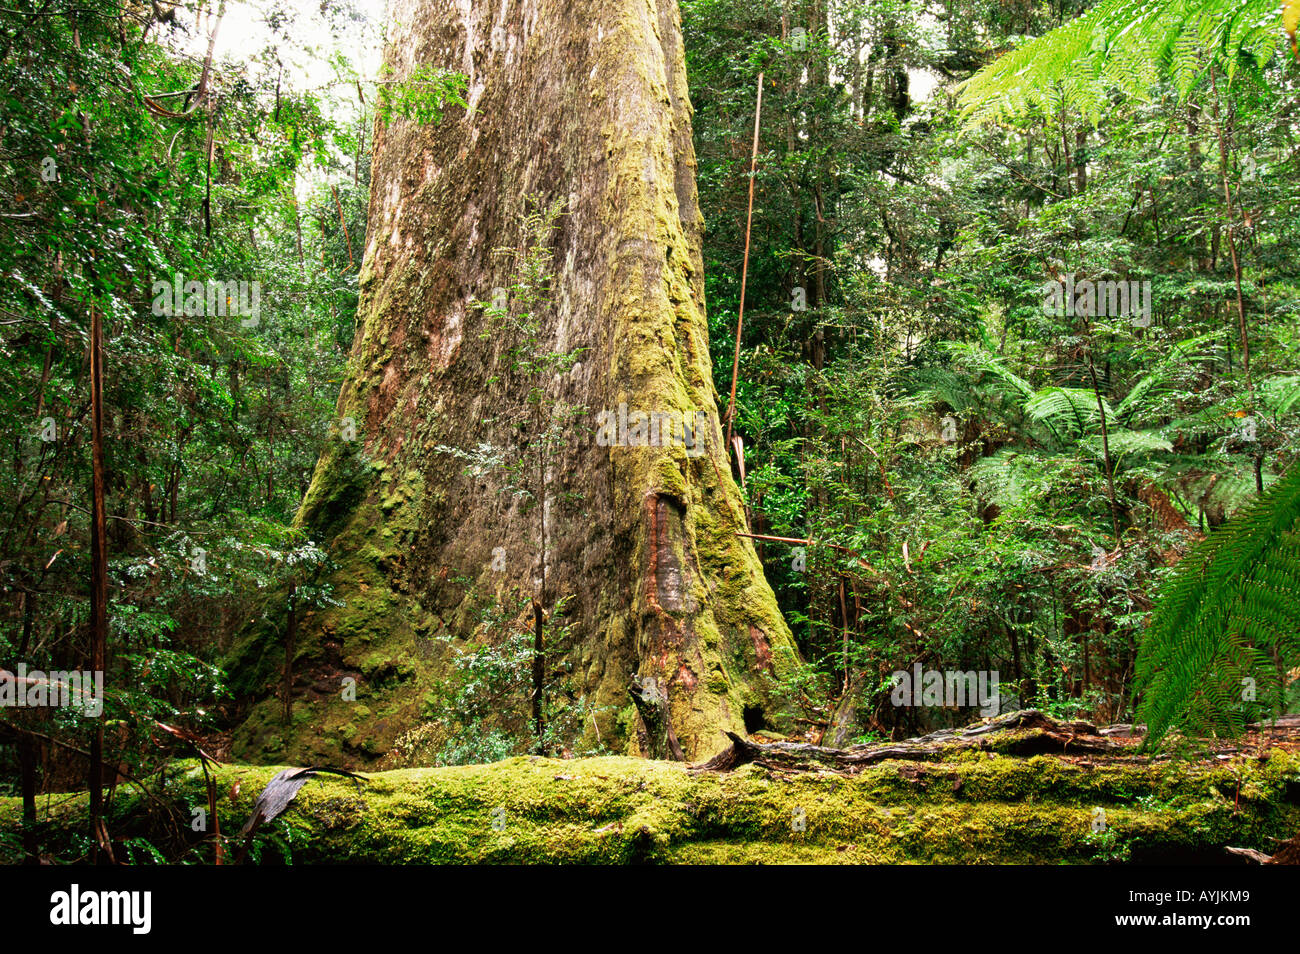 Swamp Gum Eucalyptus regnans Photographed in Tasmania Australia - Stock Image